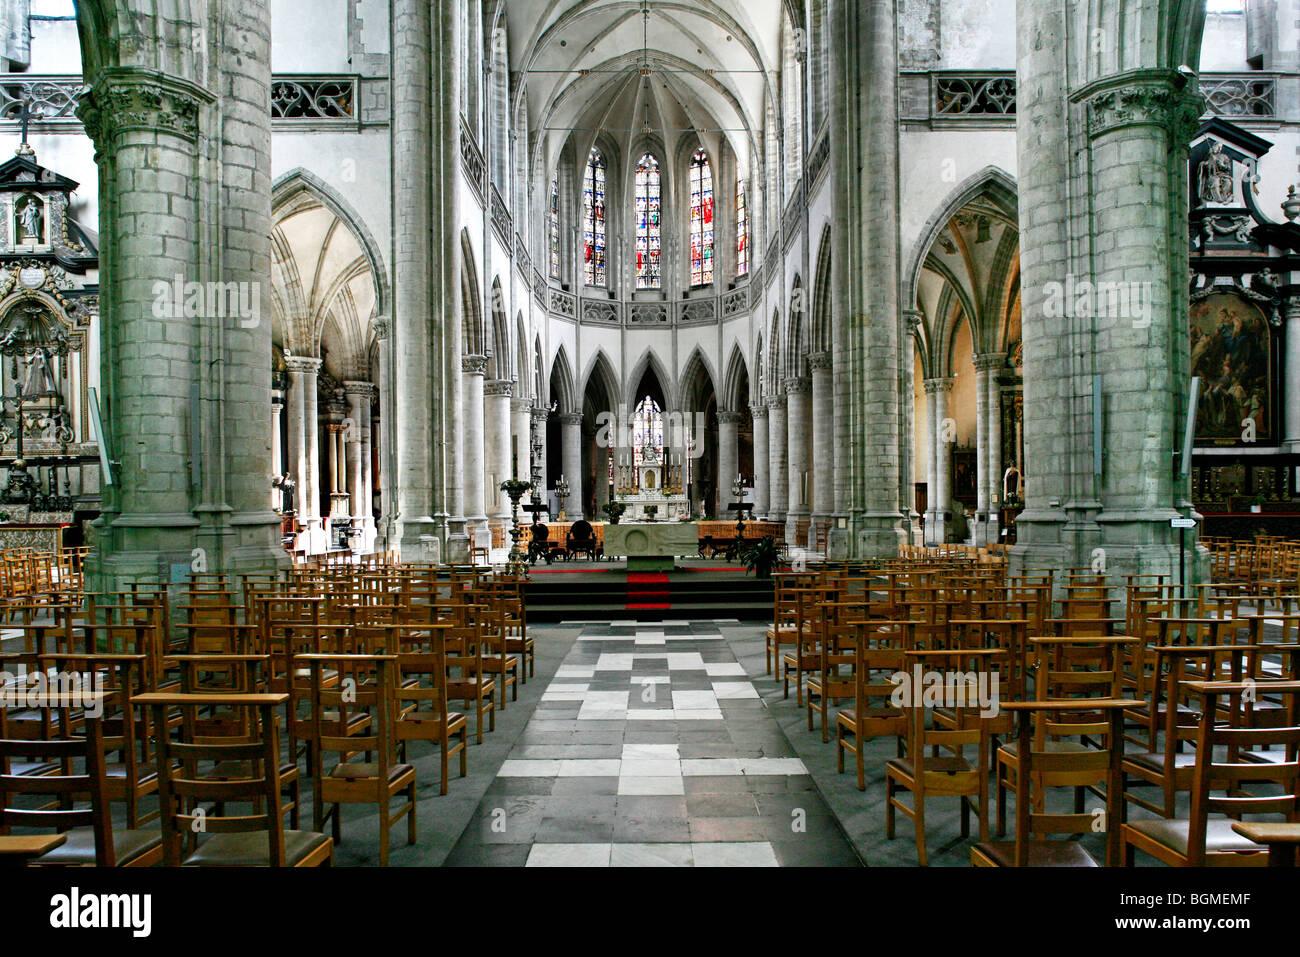 Interior Saint-Martinus church, Aalst, Belgium Stock Photo